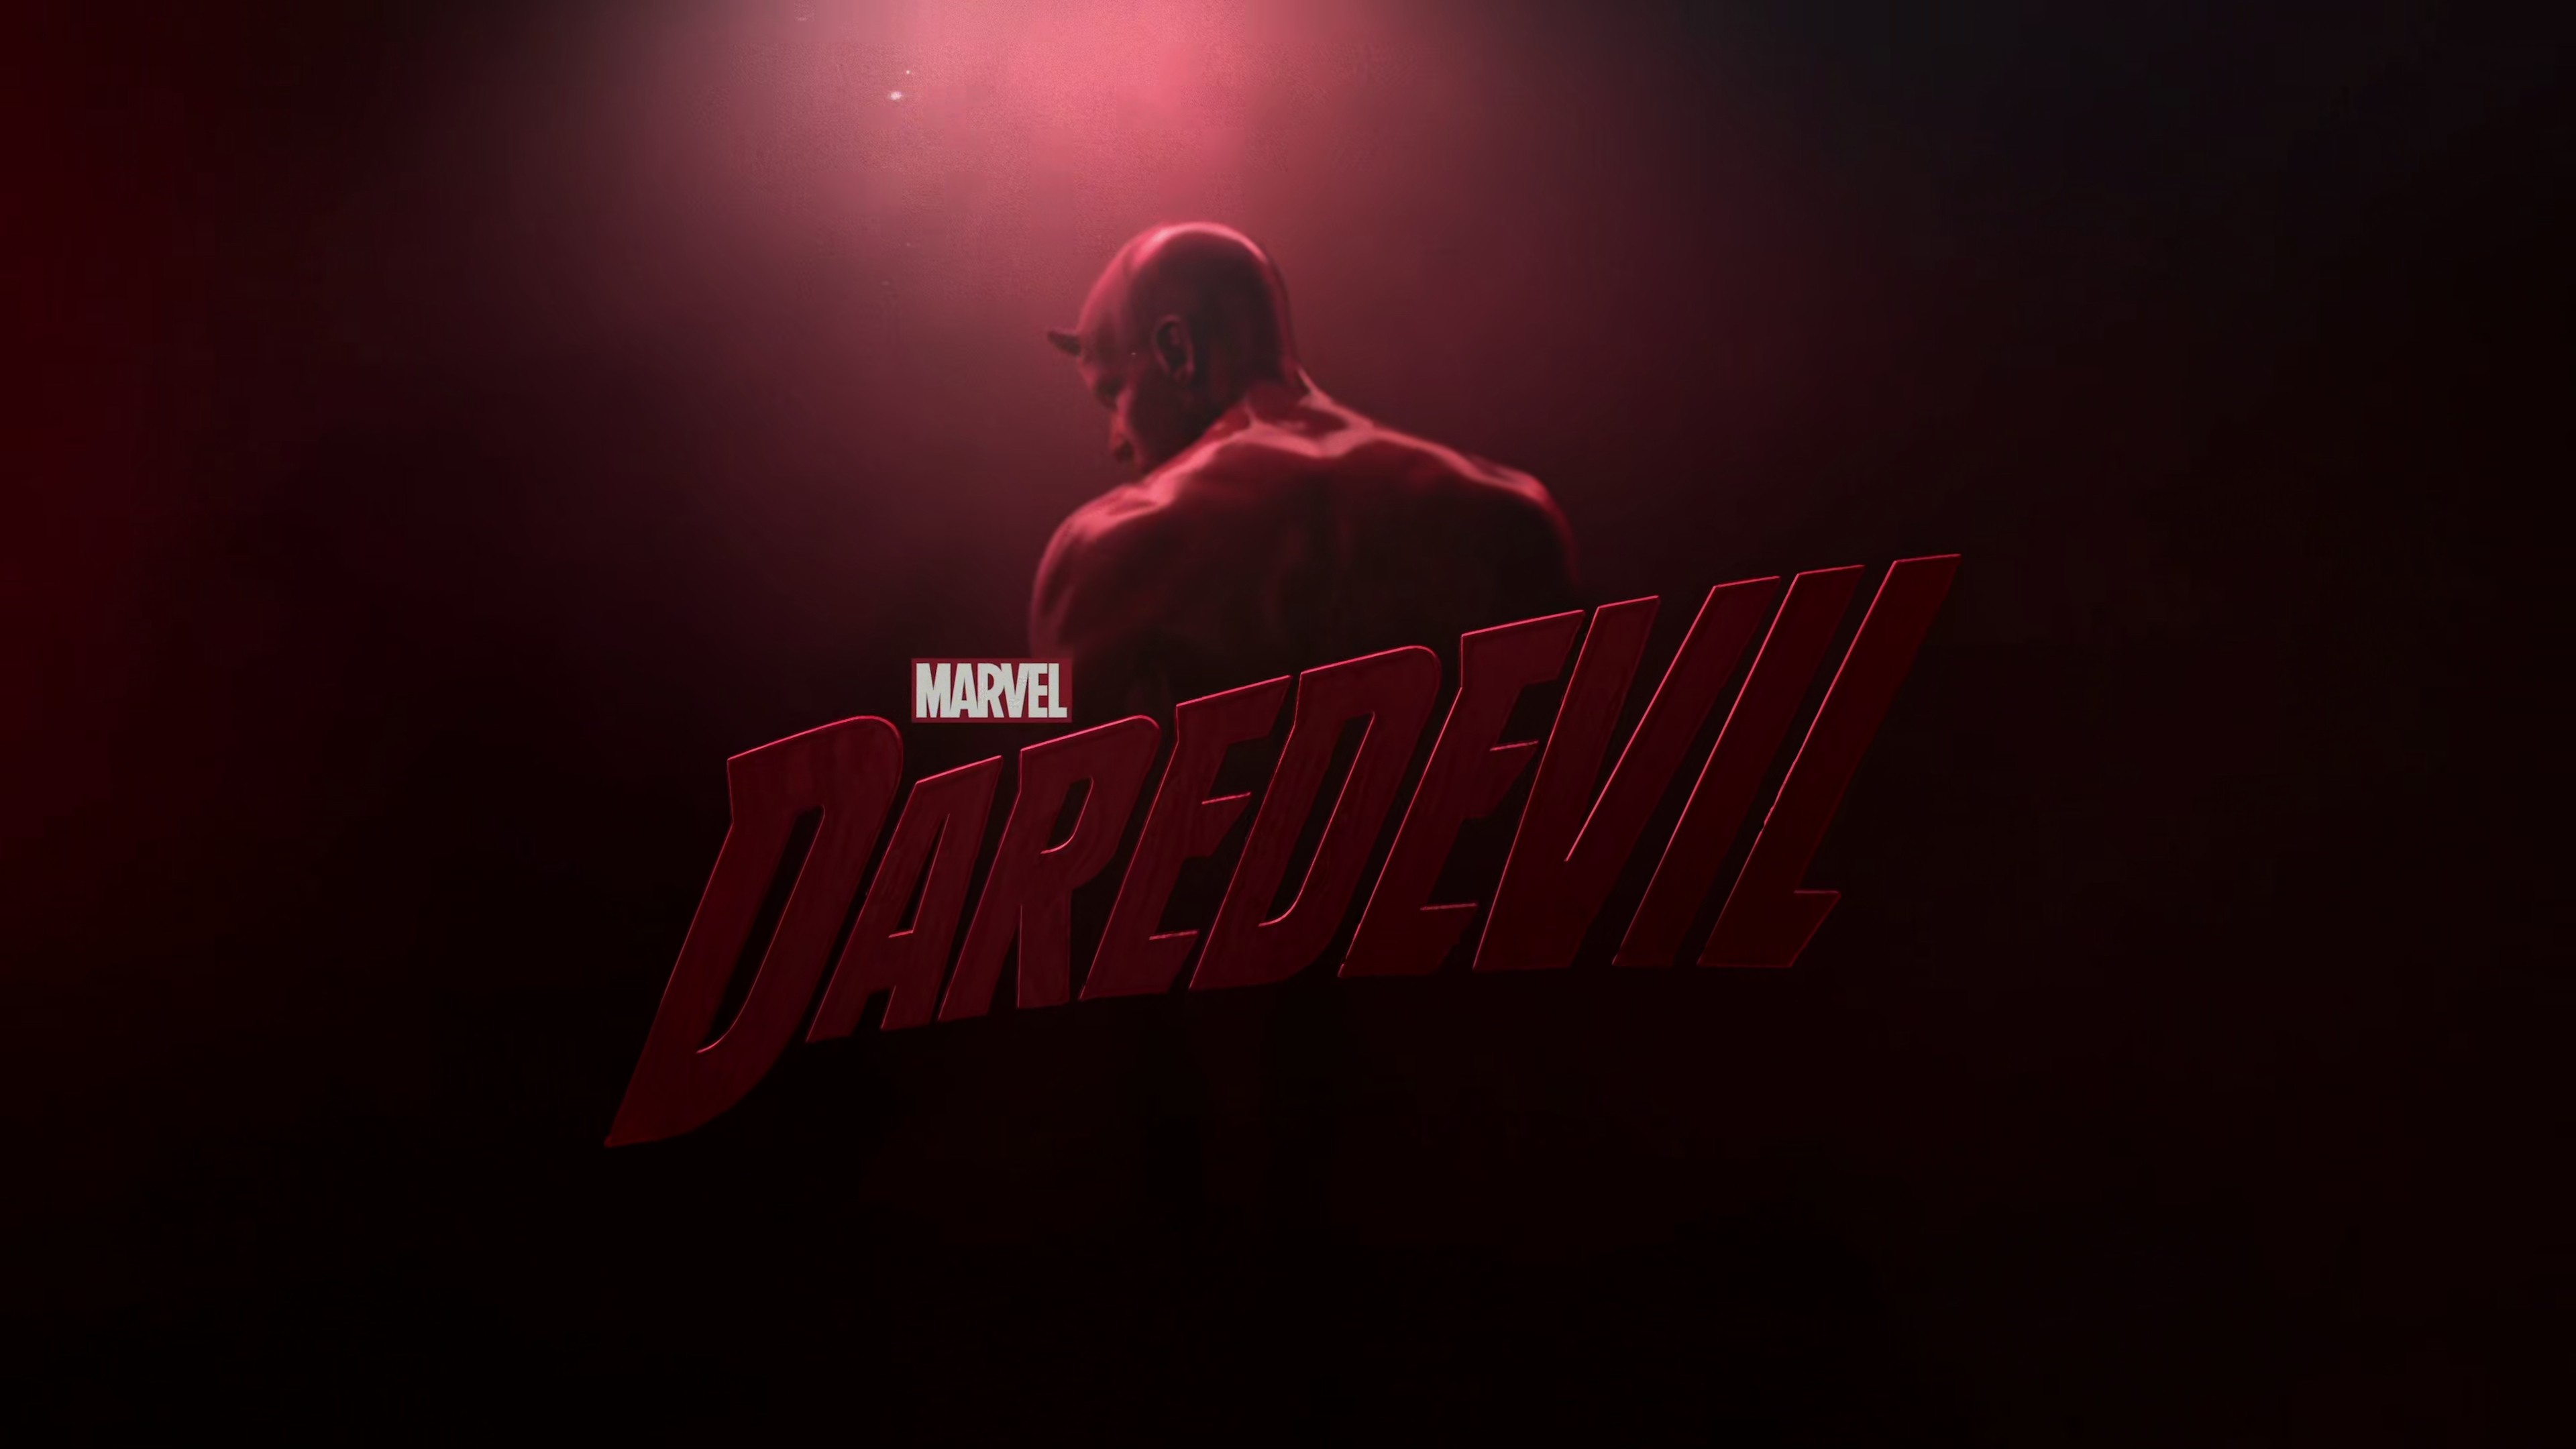 Description: Download Marvel Daredevil 4K TV Series wallpaper …